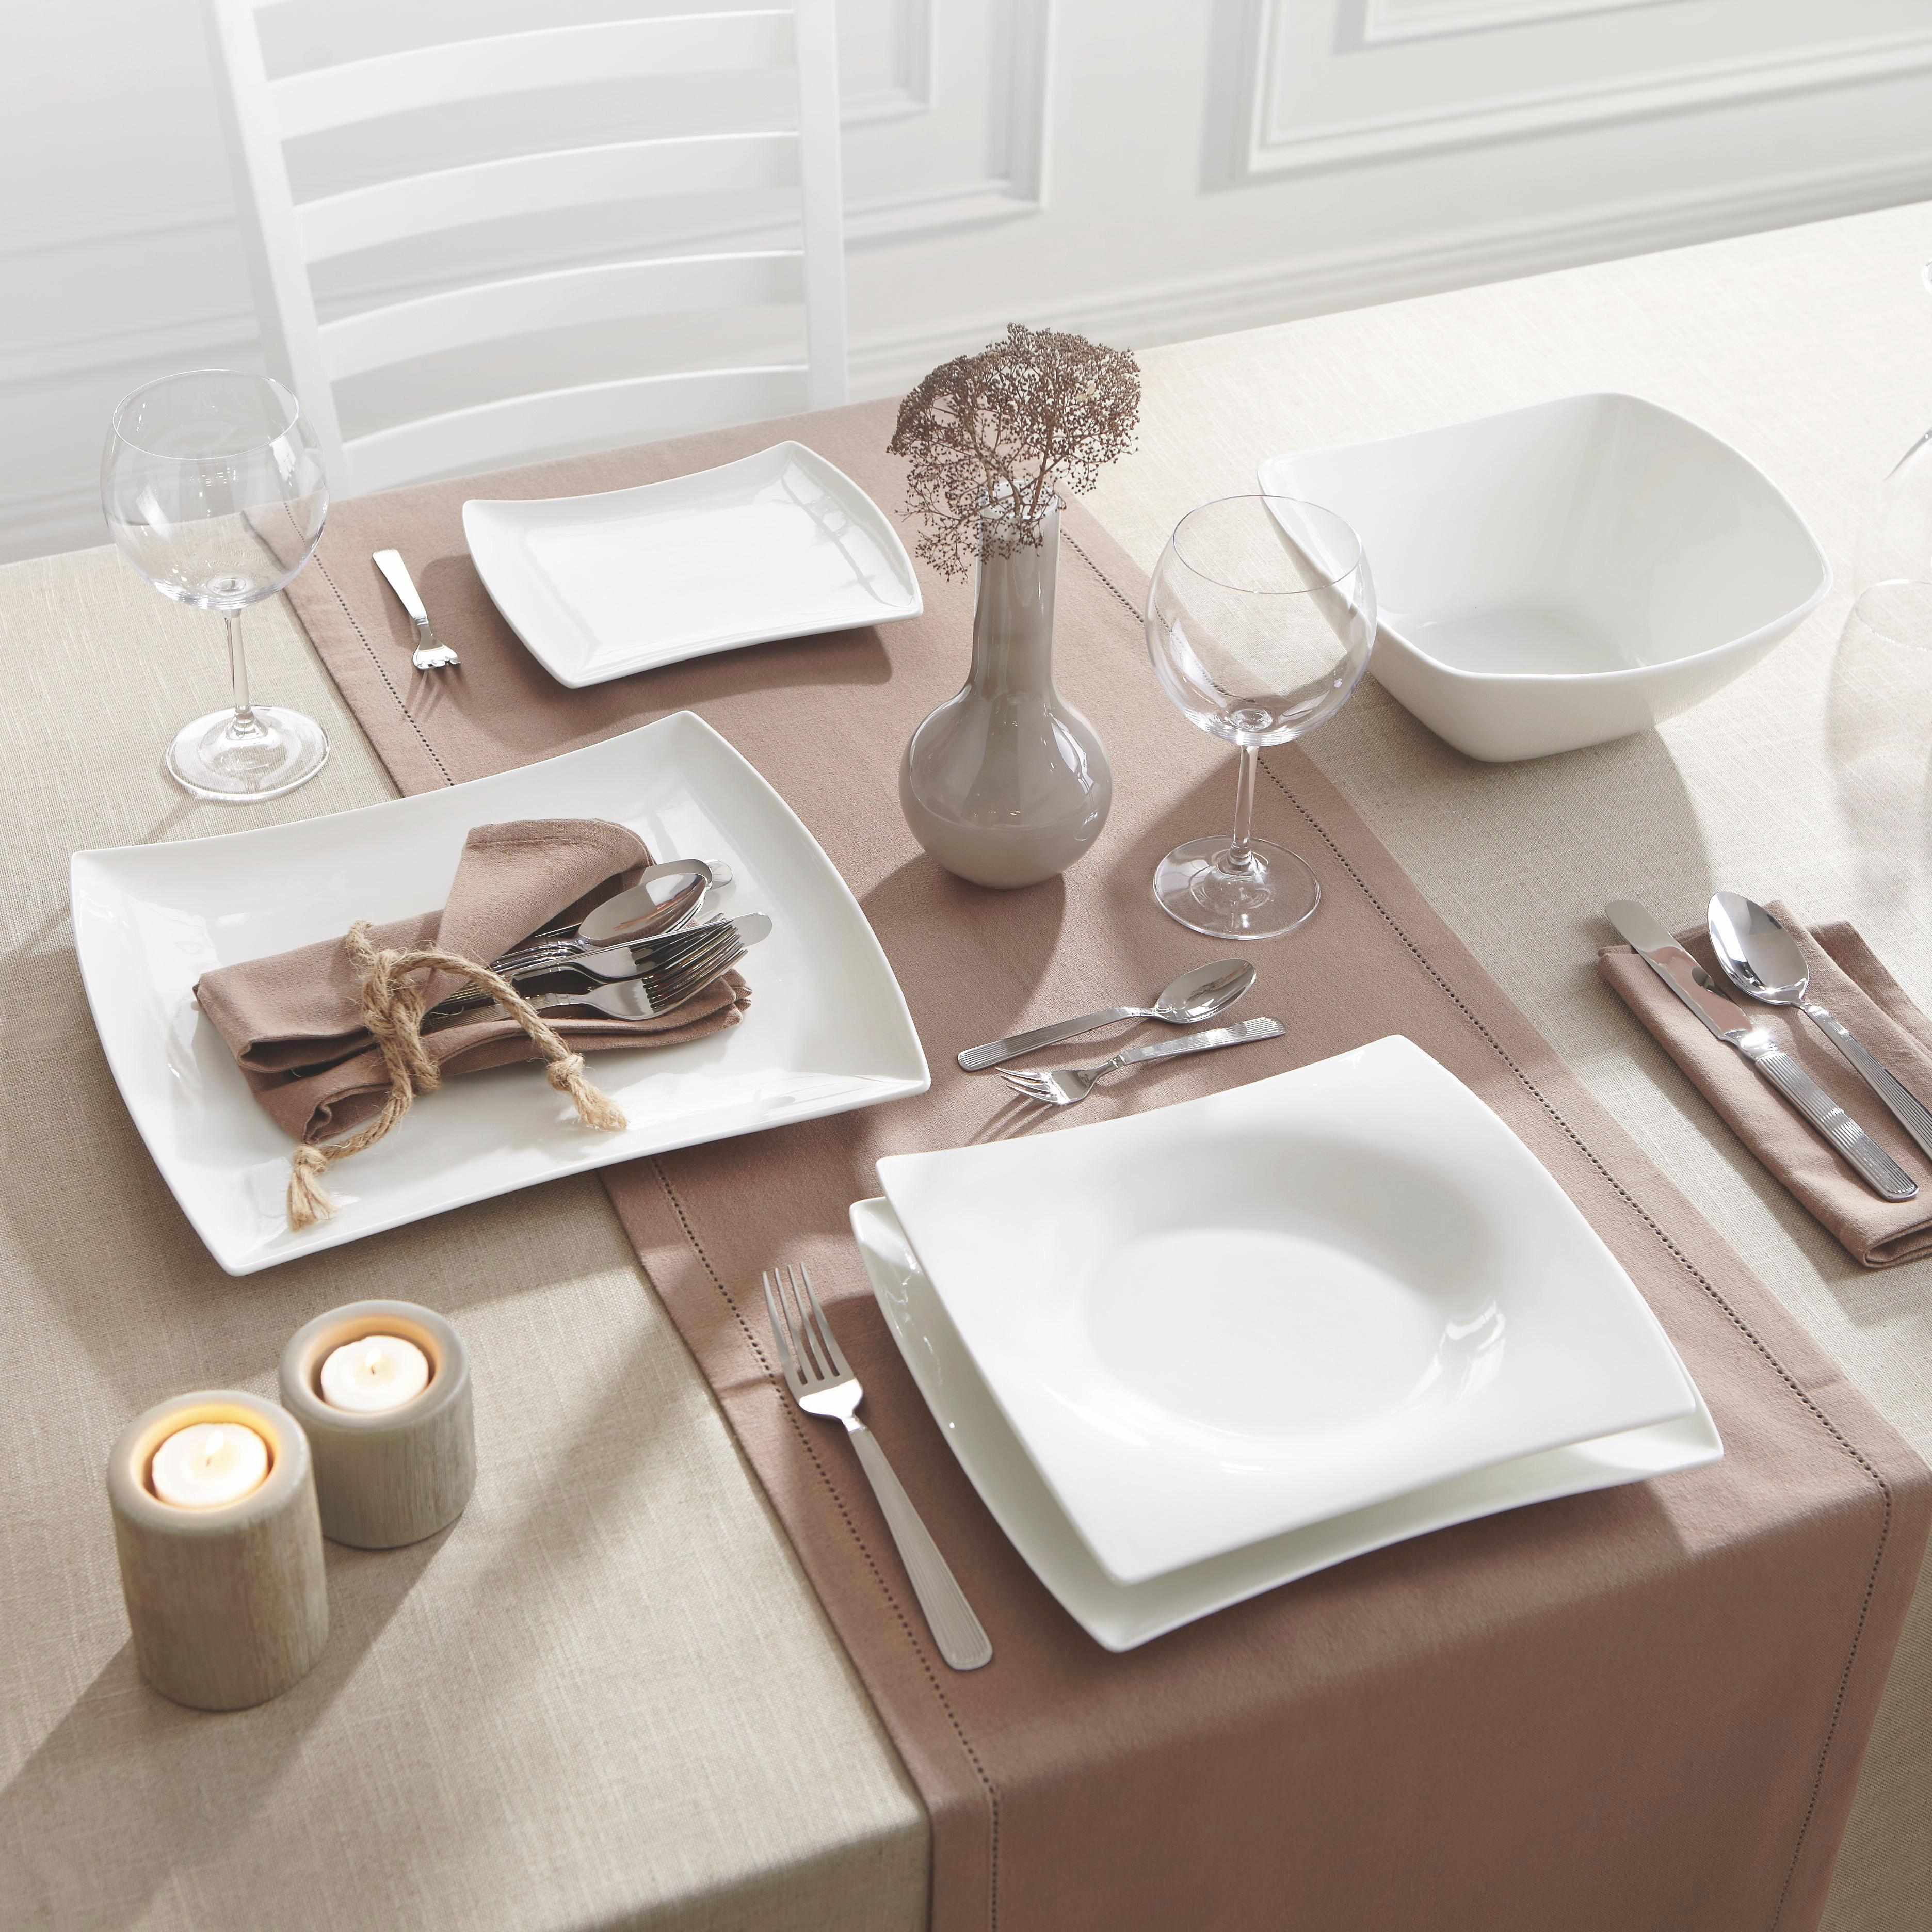 Kalíšek Na Vejce Tacoma - bílá, Lifestyle, keramika (12,6/14,2cm) - PREMIUM LIVING